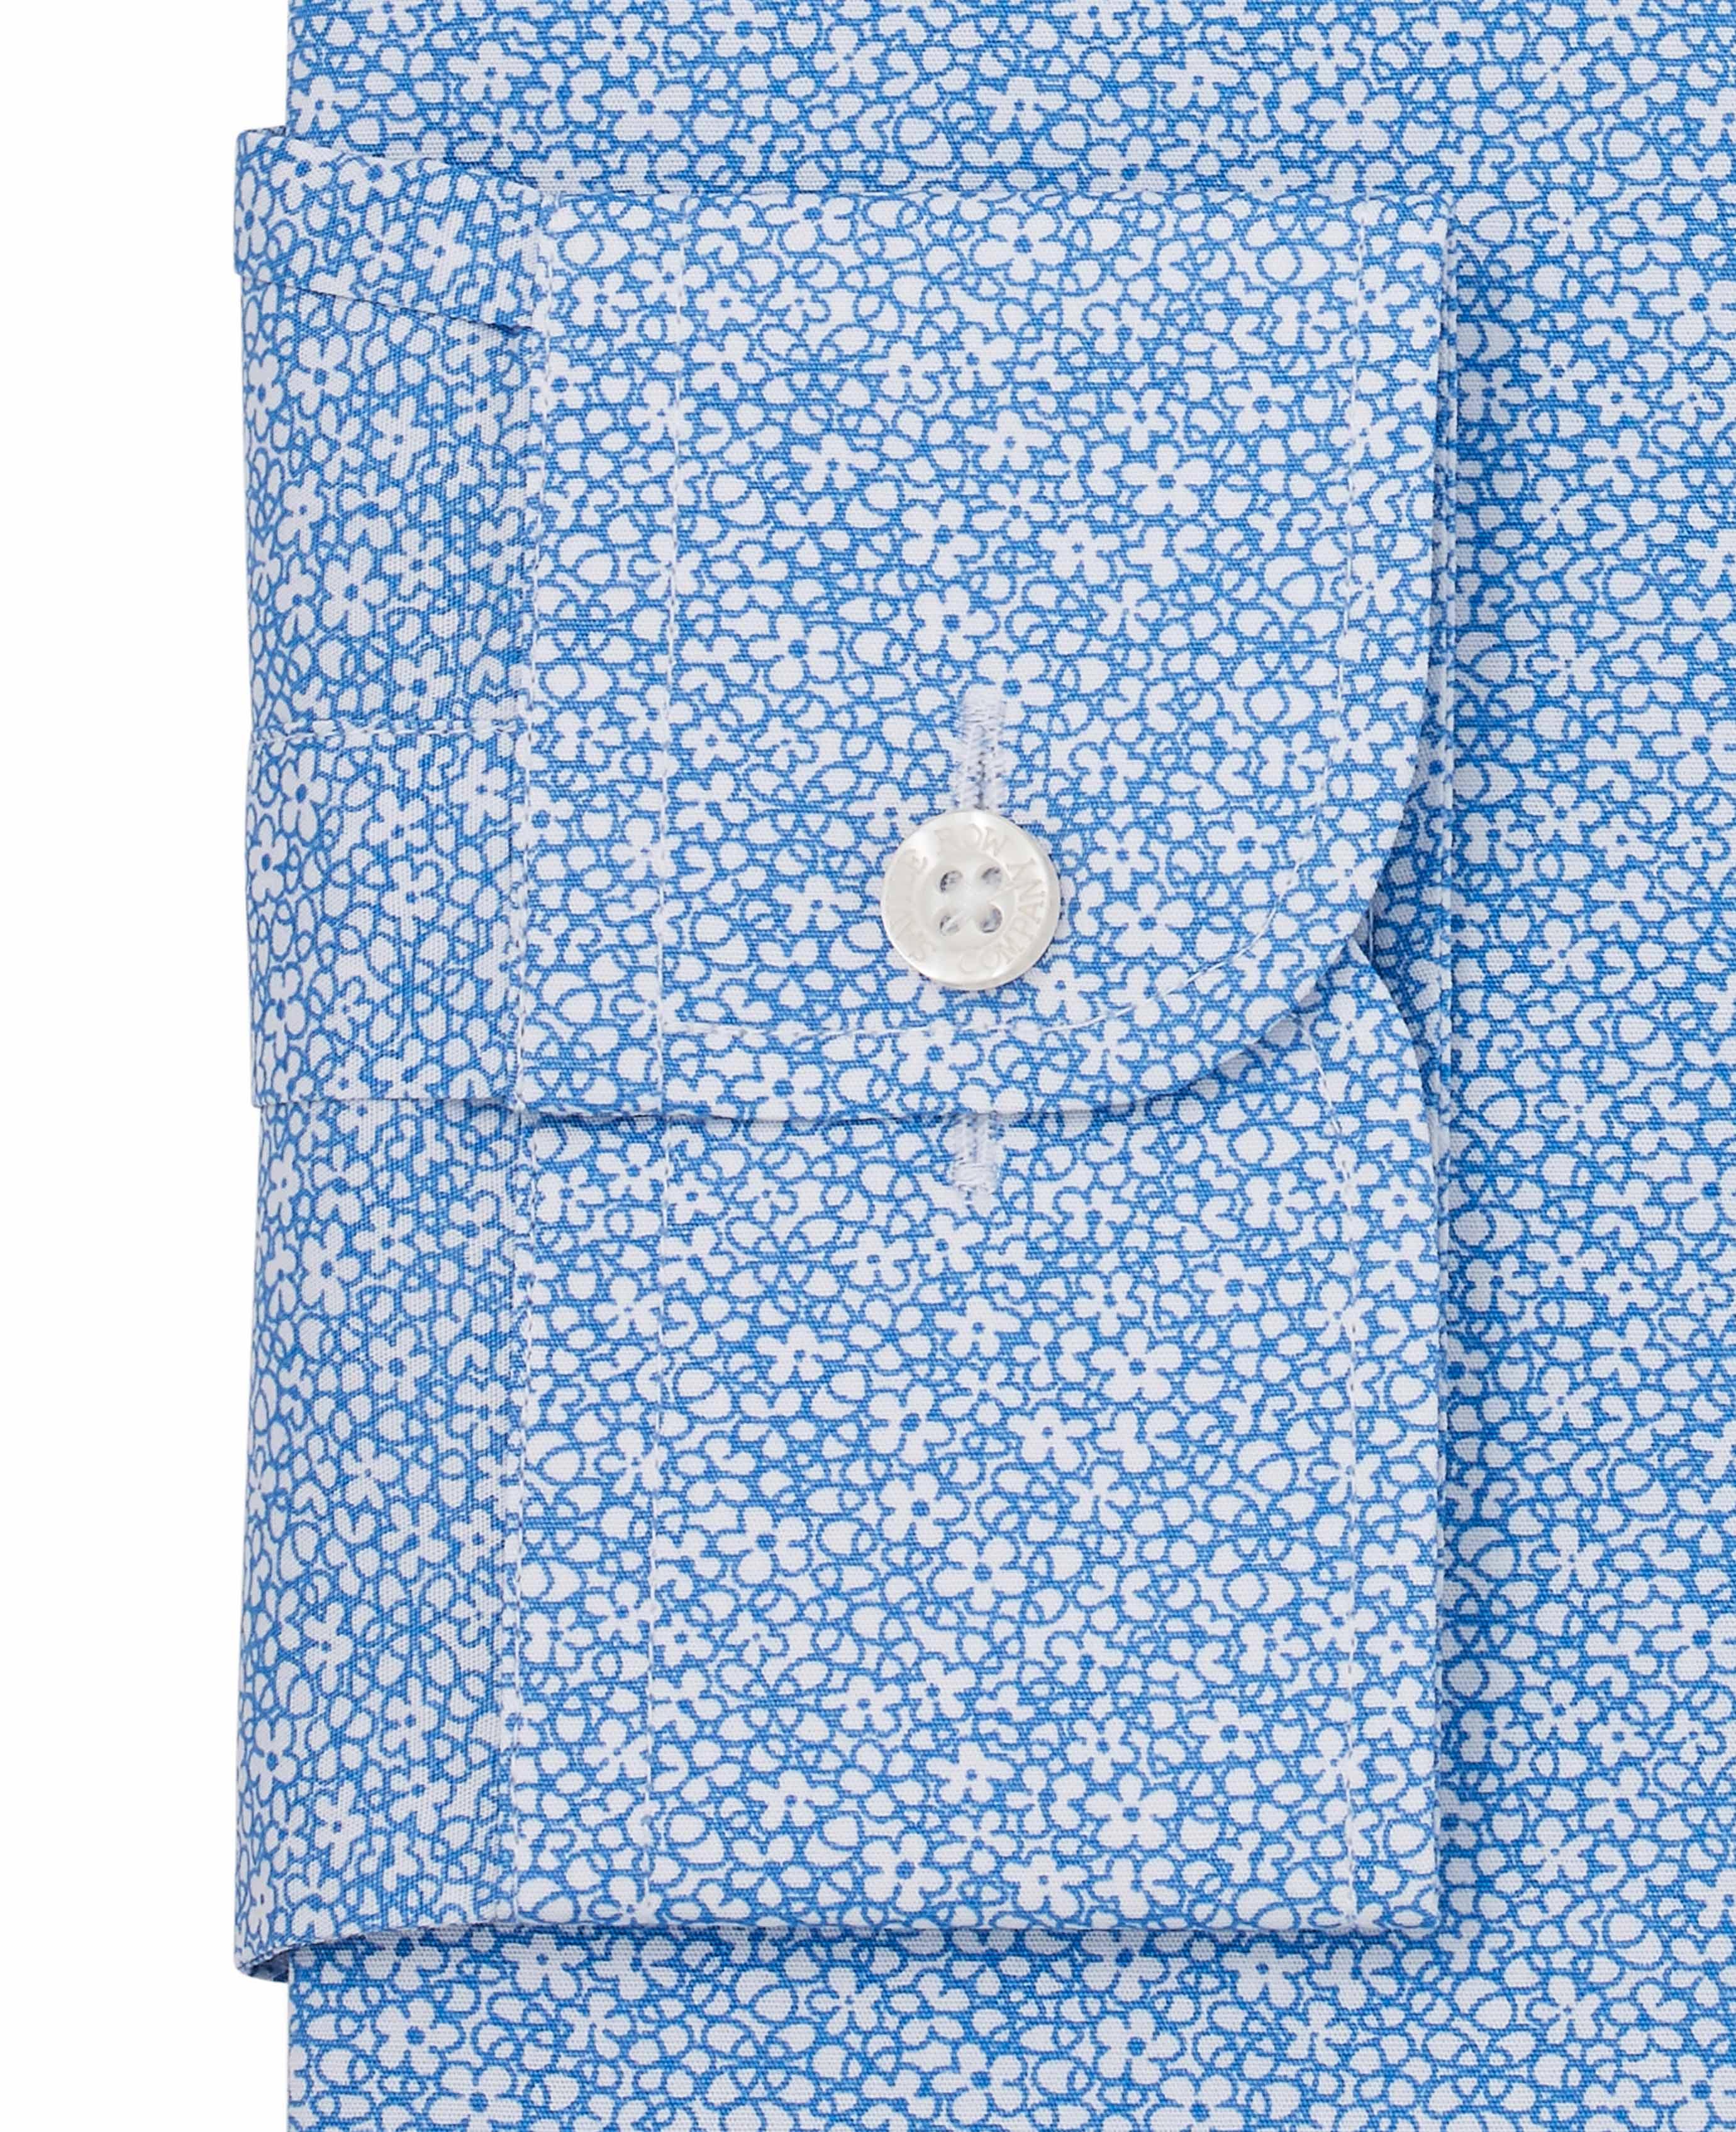 Savile-Row-Men-039-s-White-Blue-Floral-Print-Slim-Fit-Shirt-Single-Cuff thumbnail 4